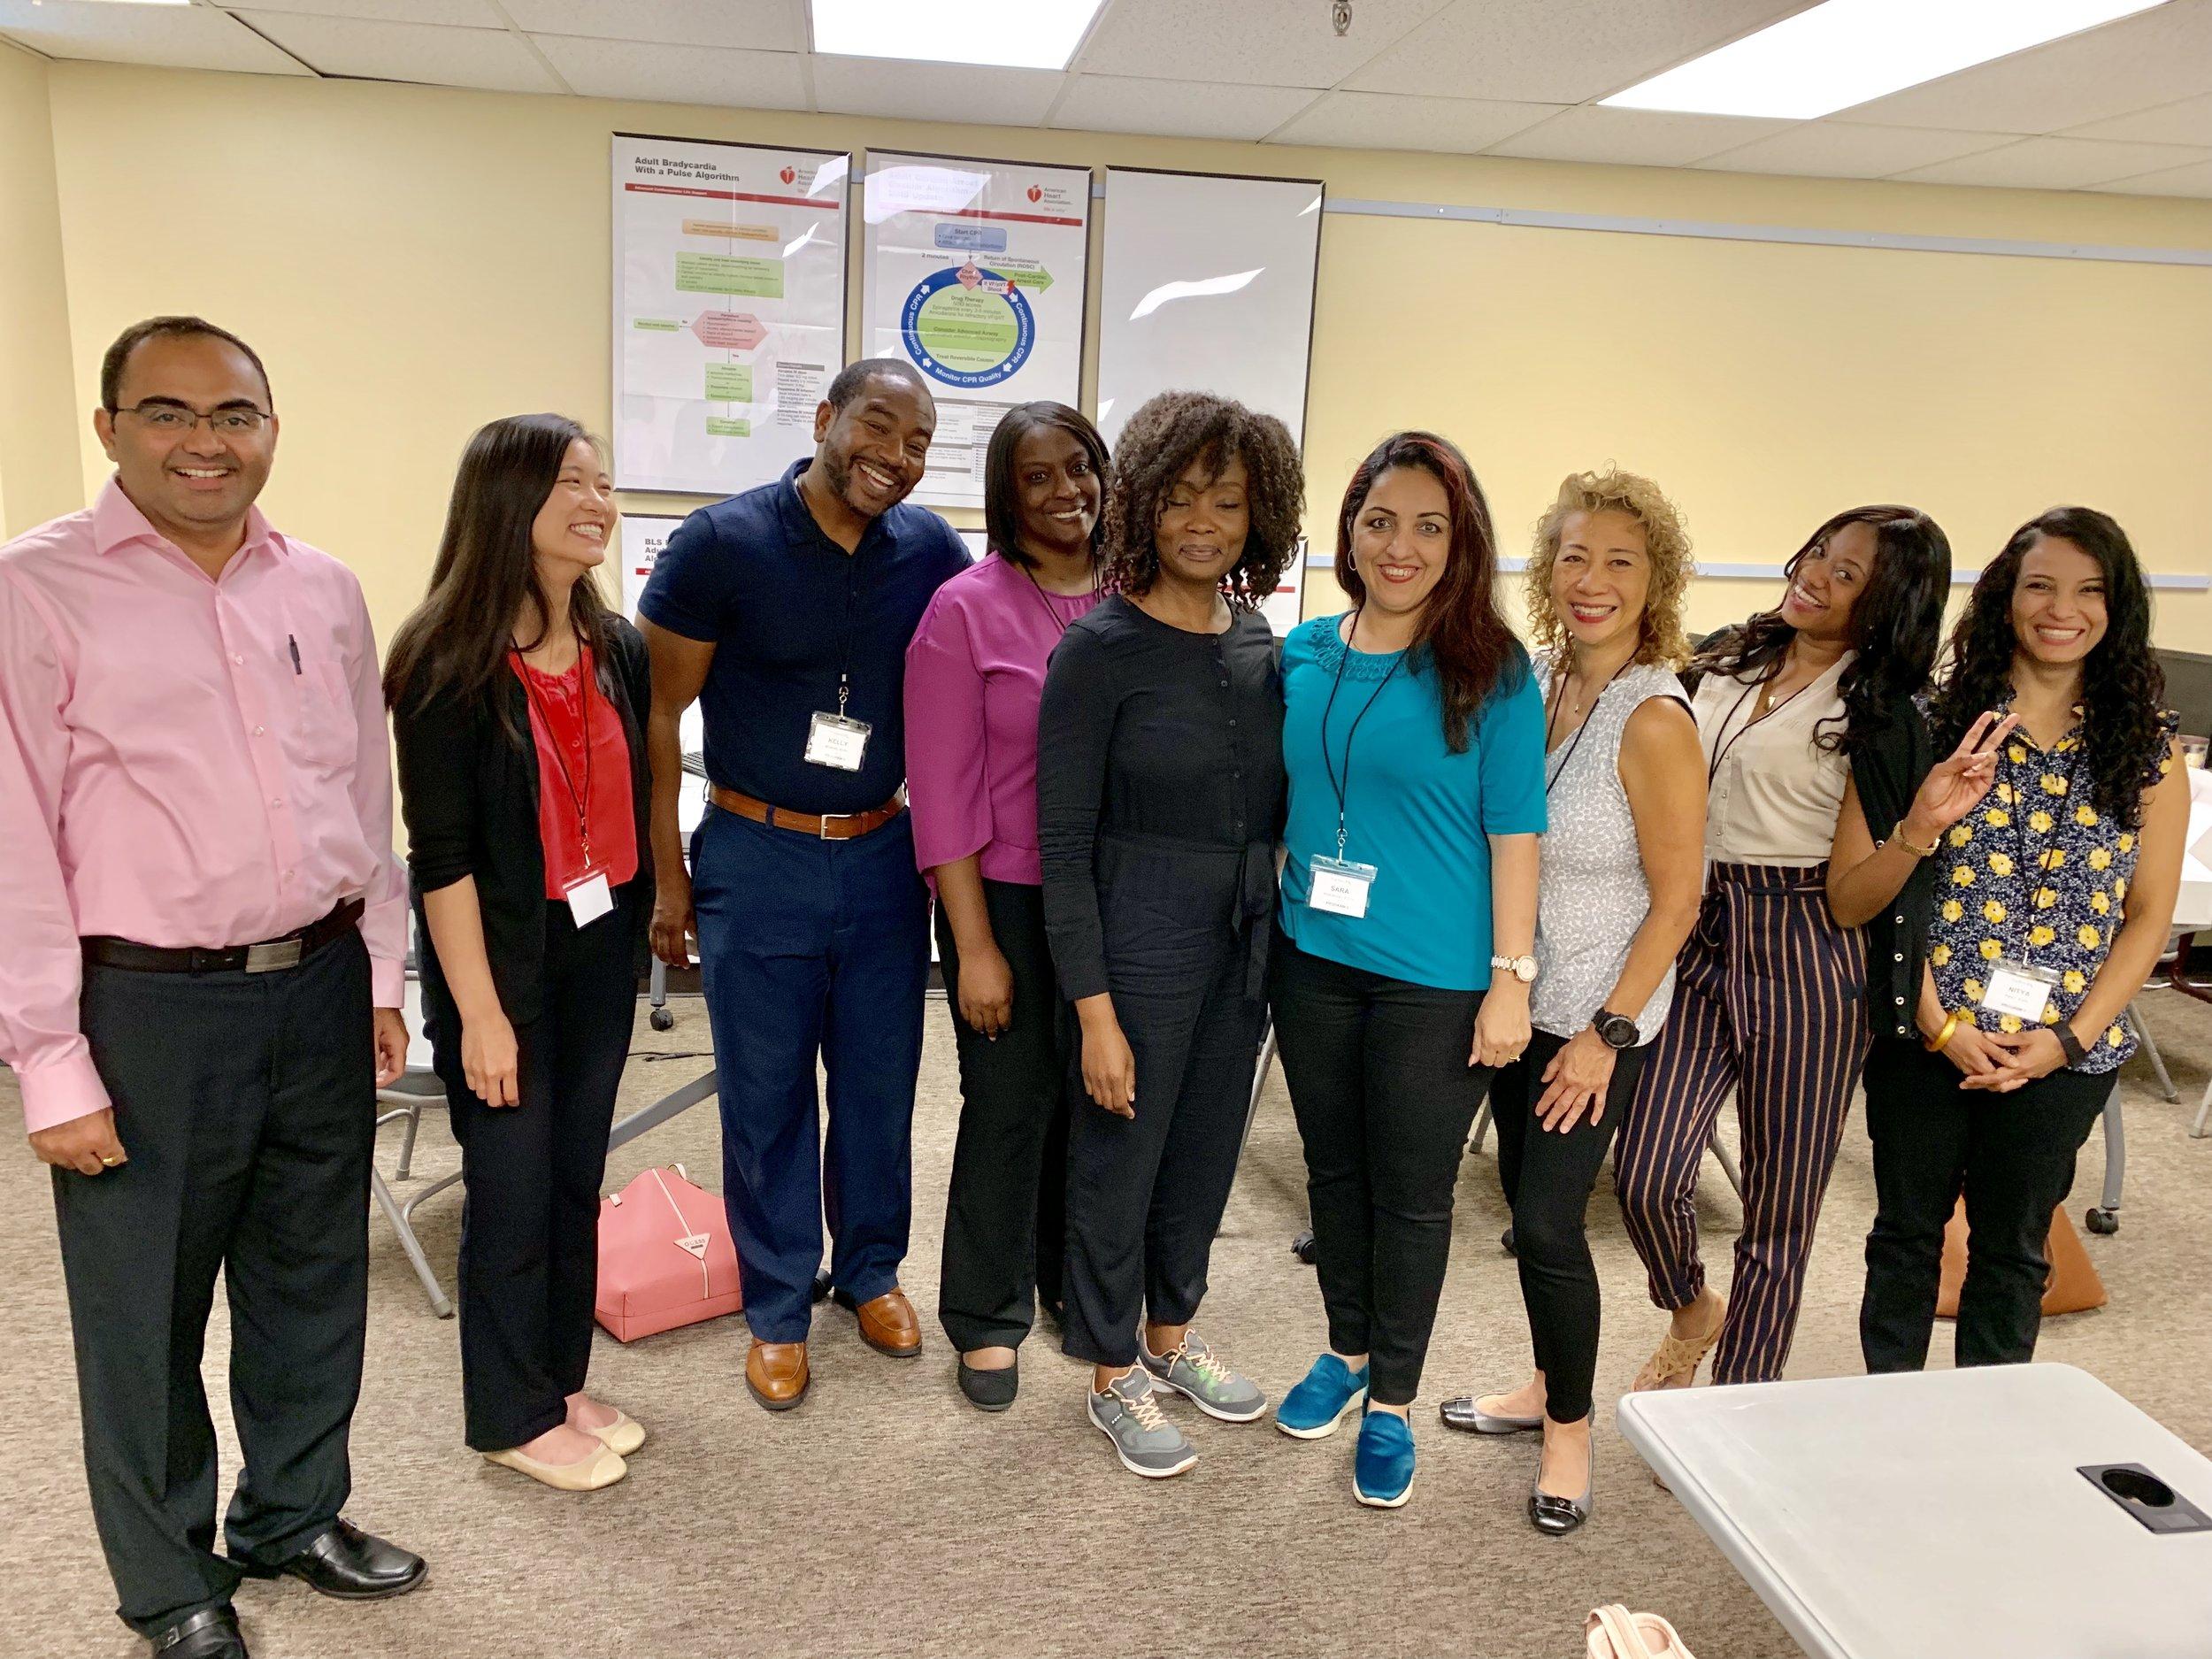 Hospital Pharmacy Prep Course Students - August 2019